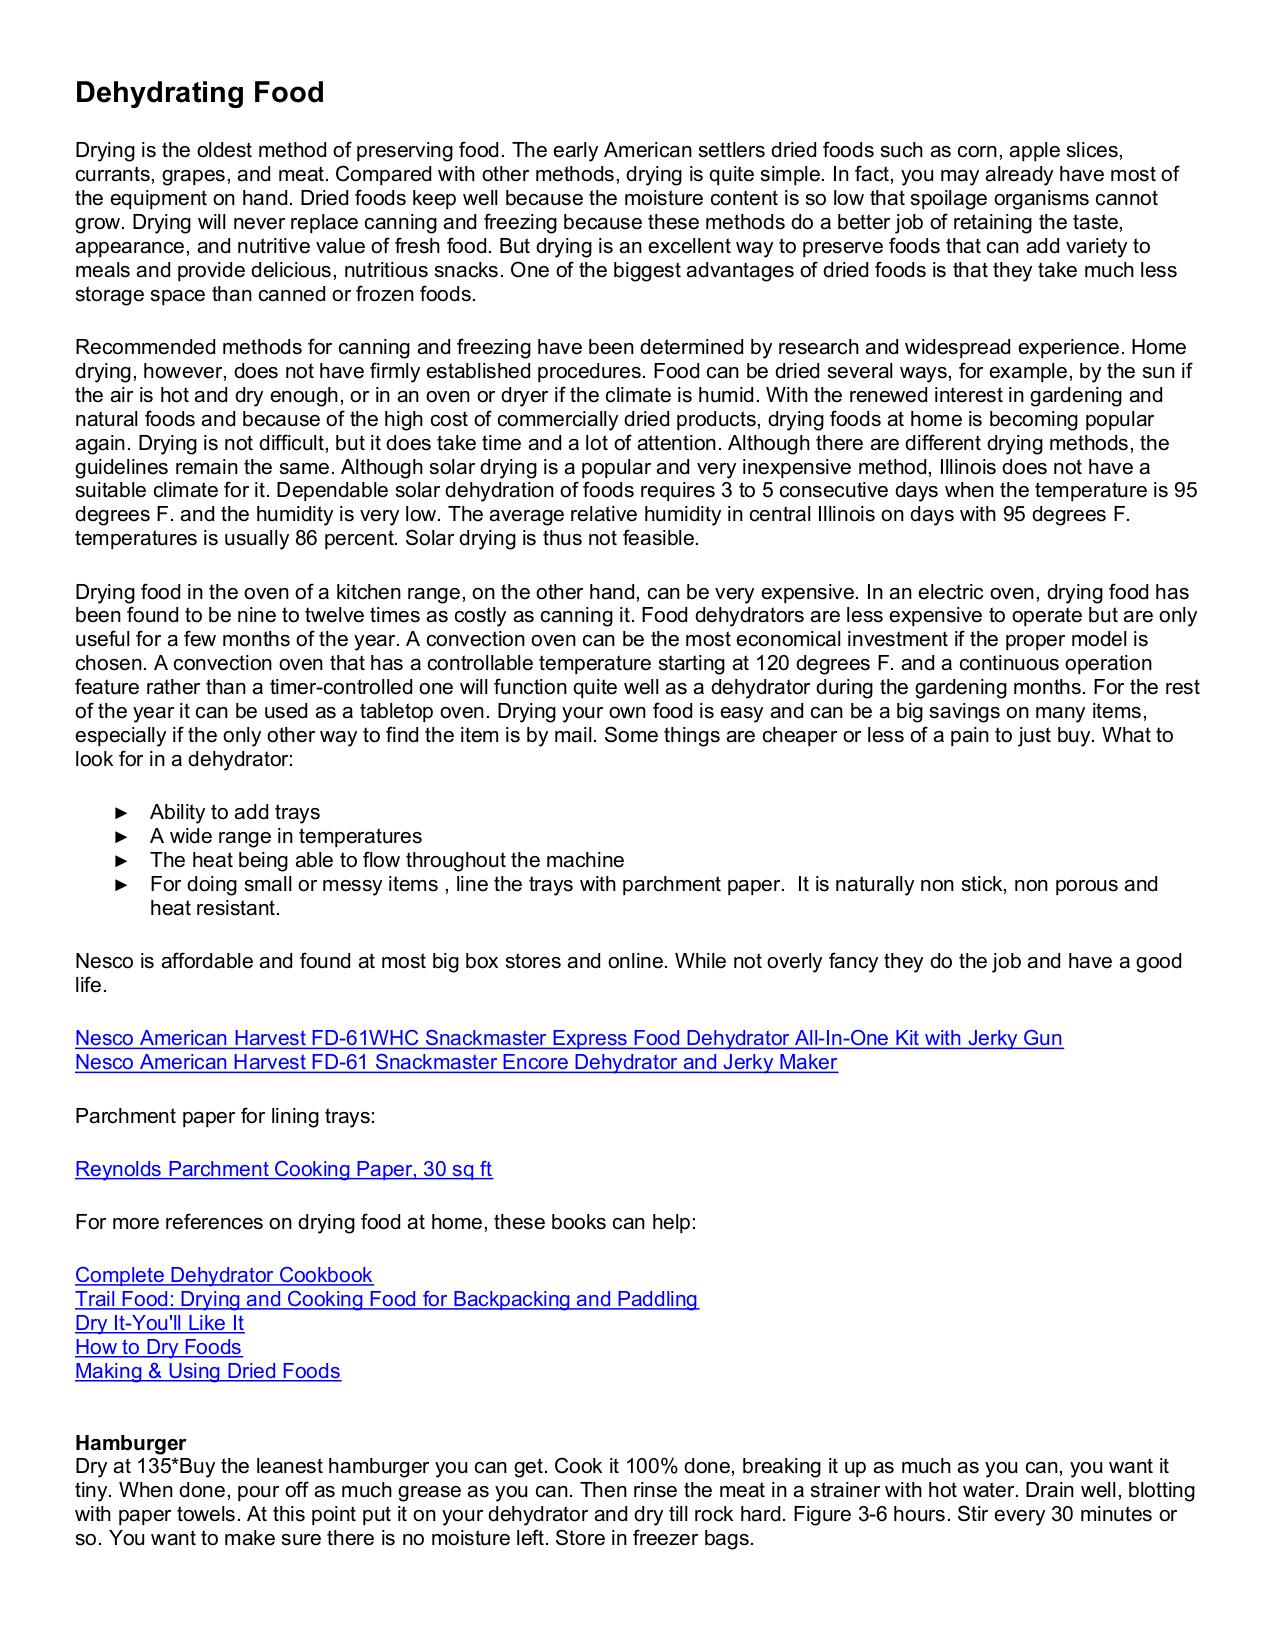 Nesco food dehydrator manual food free pdf for nesco fd 60 food dehydrator other manual forumfinder Gallery